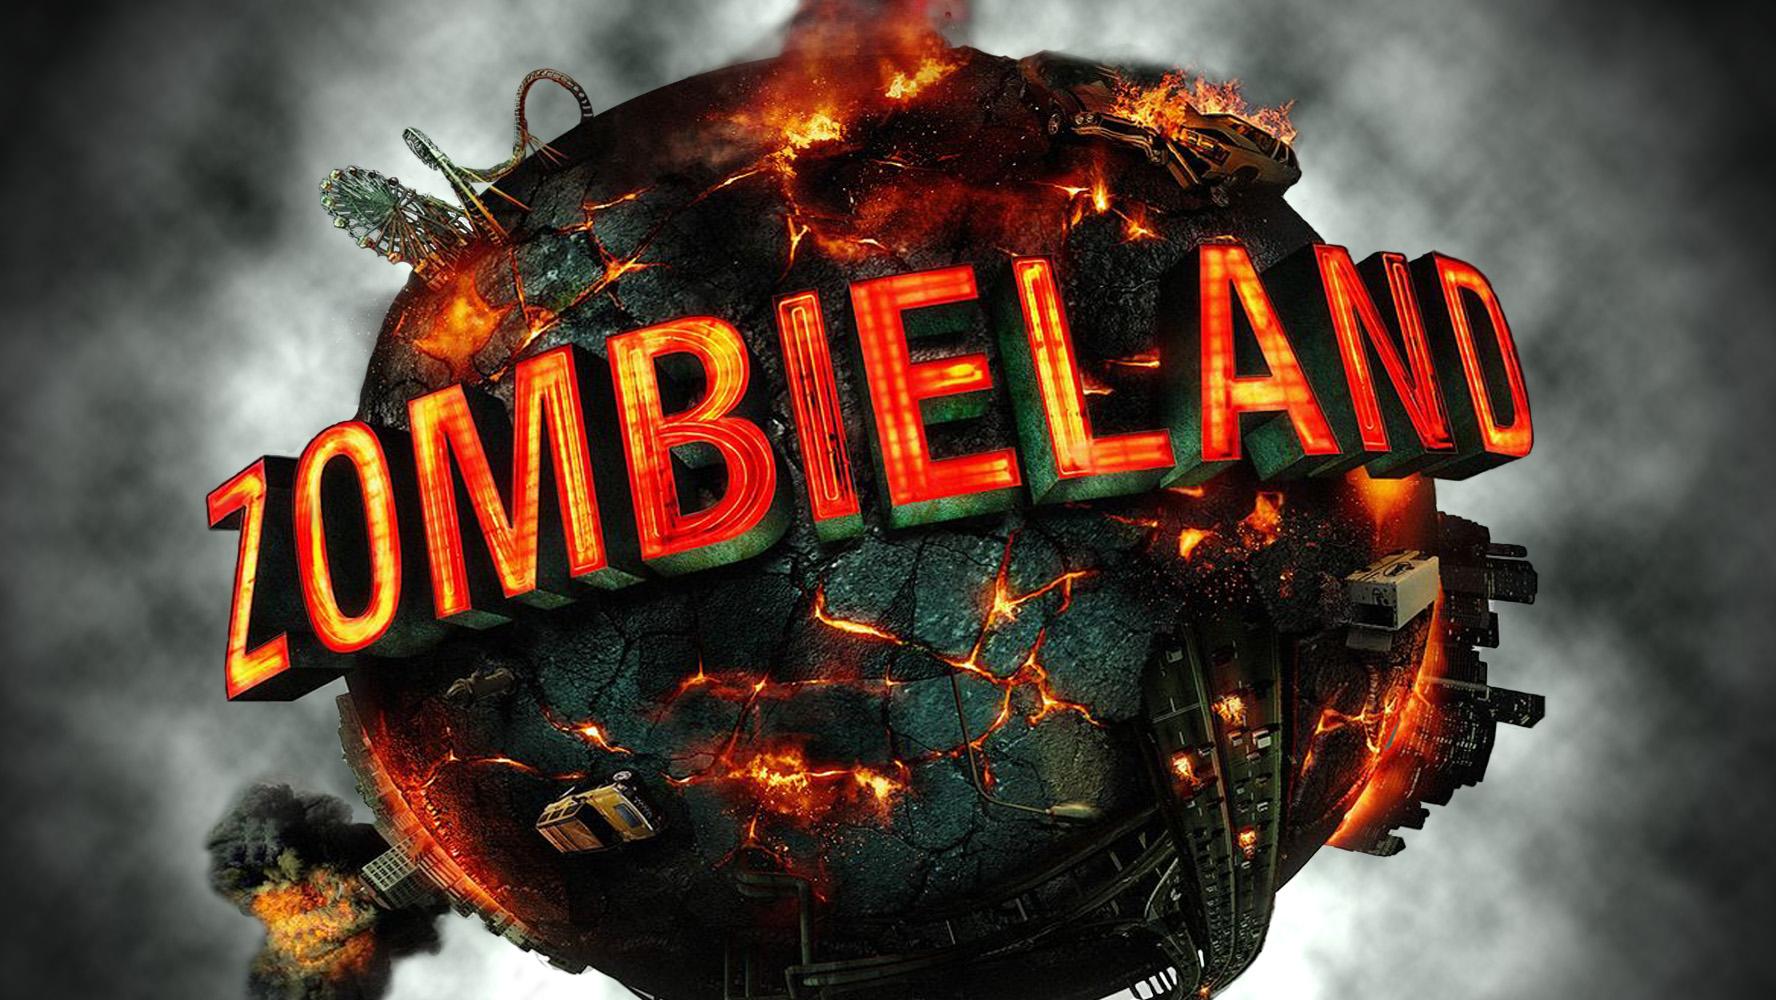 Zombieland rules wallpaper